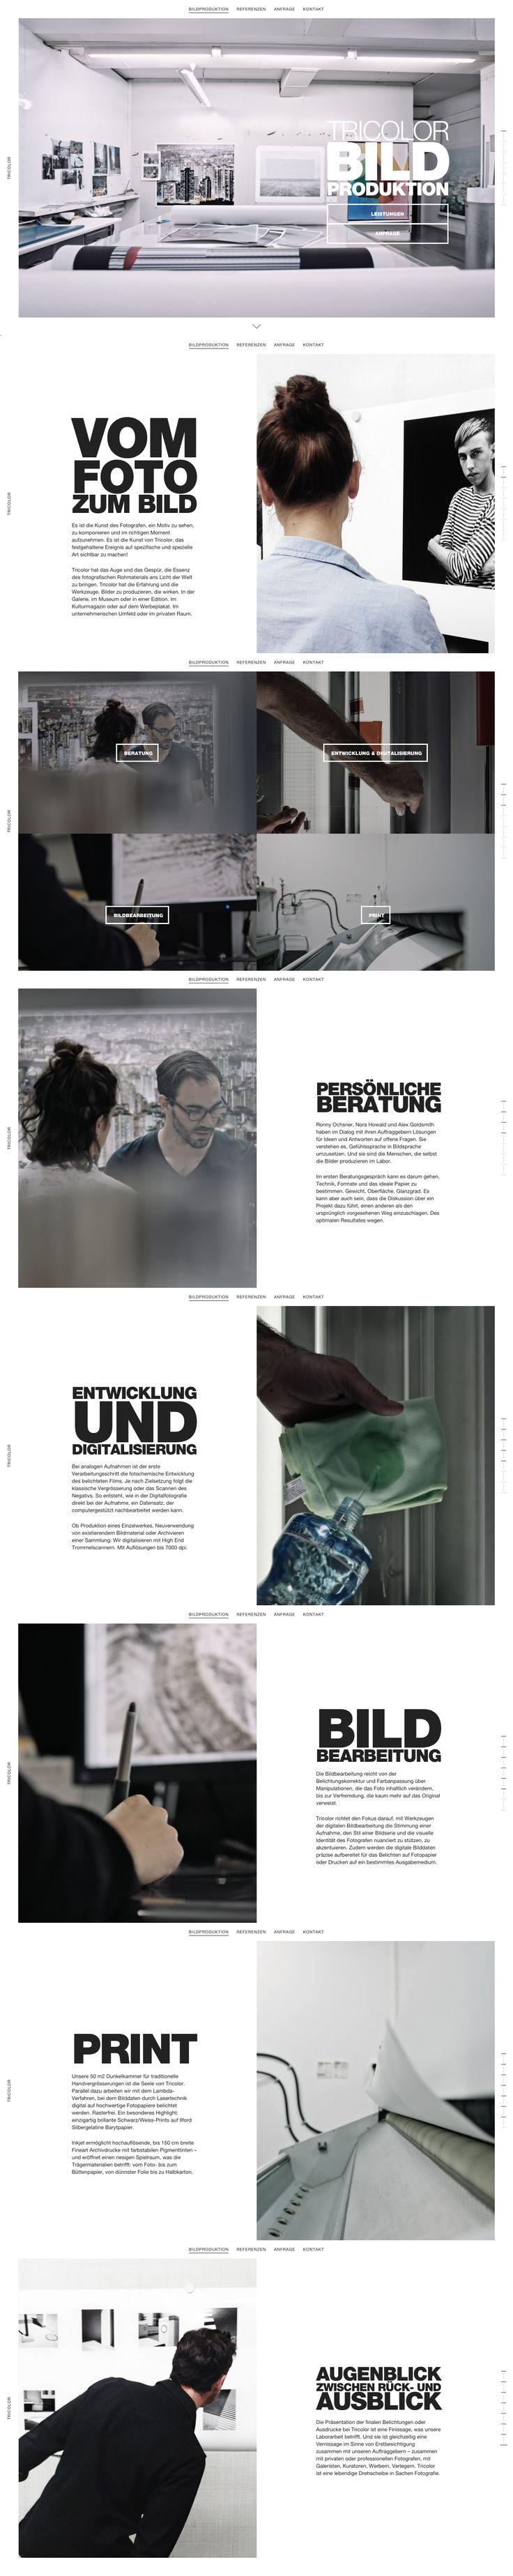 Vom Foto zum Bild Tricolor  #webdesign #hinderlingvolkart #design #indentity #ux #ui #html5 #video #scroll  http://www.tricolor.ch/